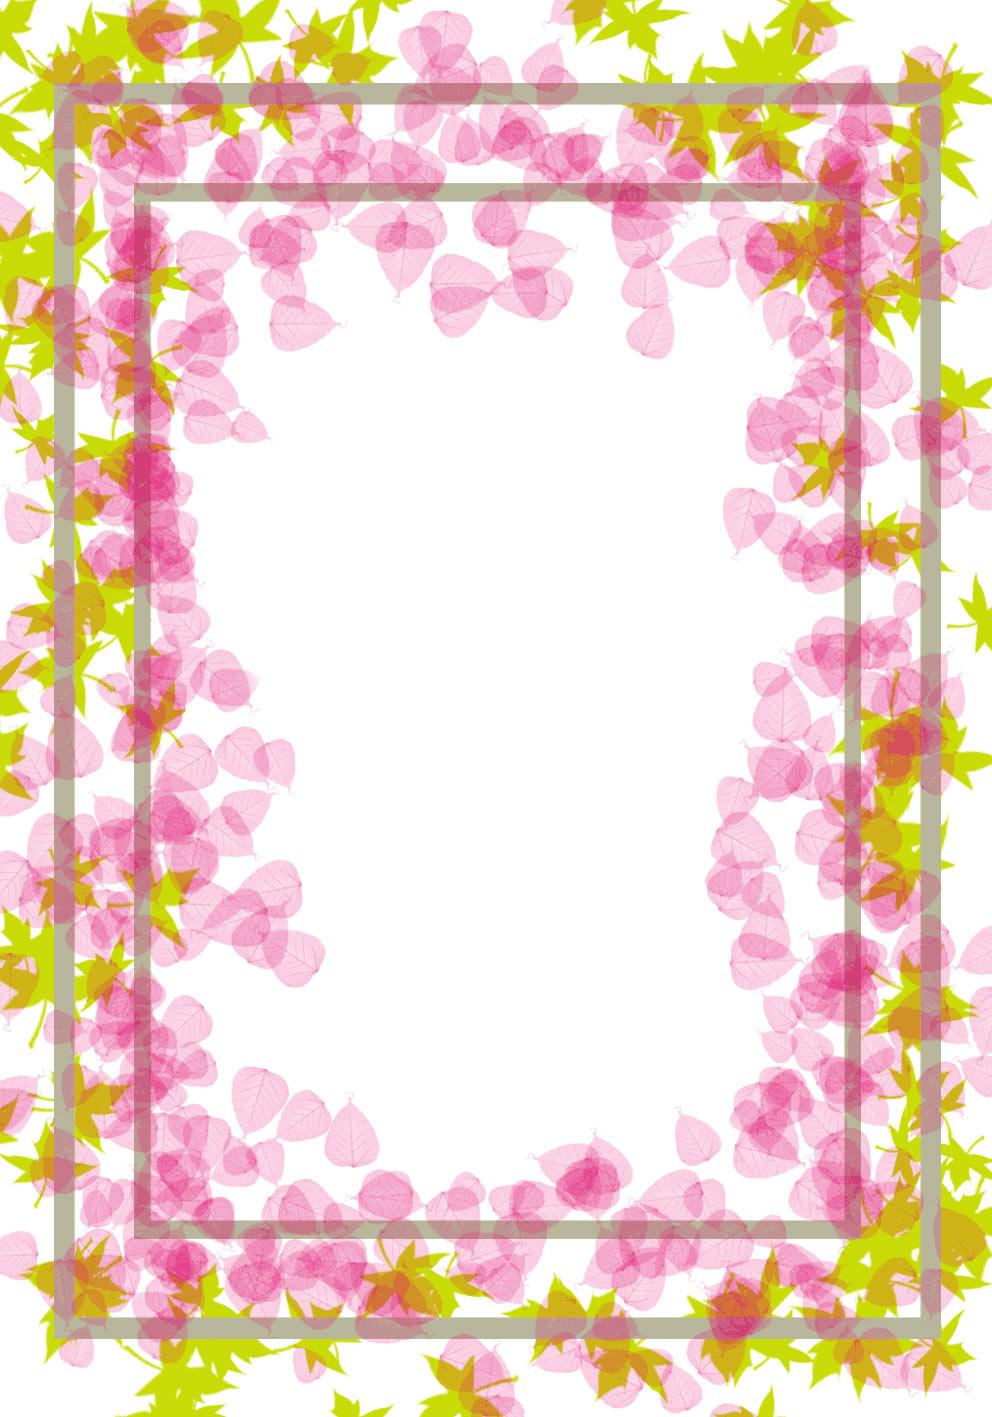 Http://caratulatrabajo.blogspot.com/2014/05/femenino-hojas-rosadas-y ...